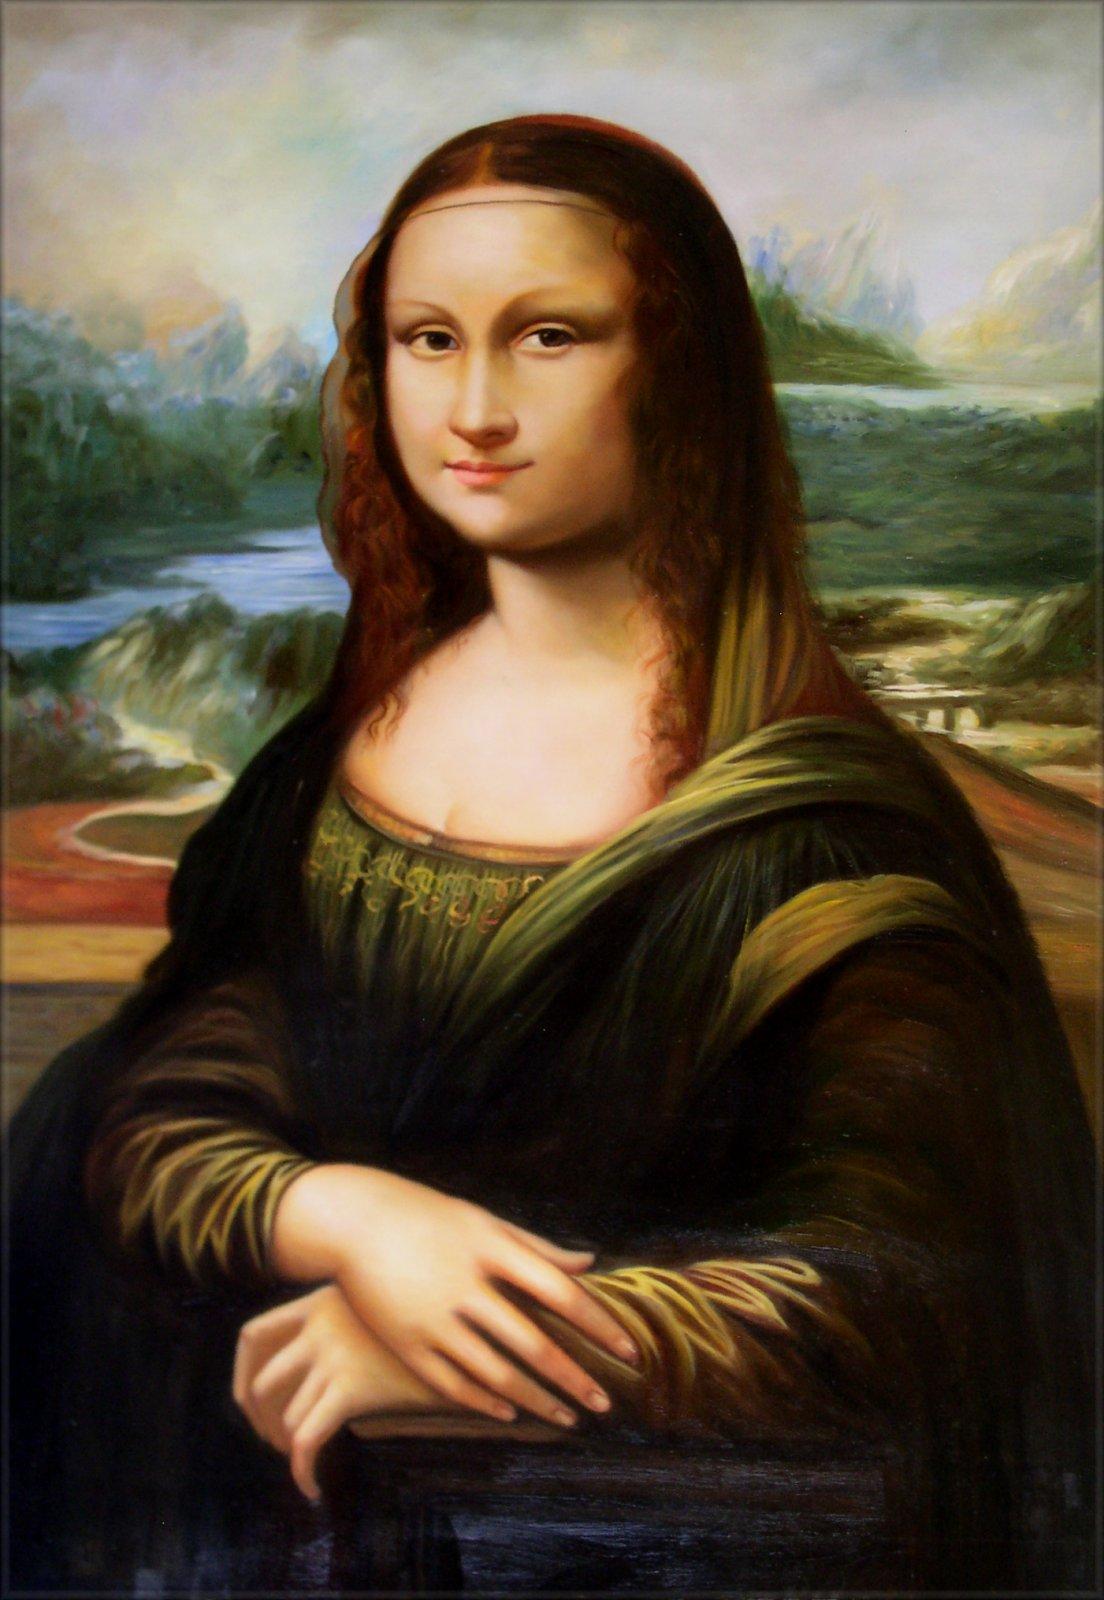 Framed Da Vinci Mona Lisa Repro Quality Hand Painted Oil ... Da Vinci Mona Lisa